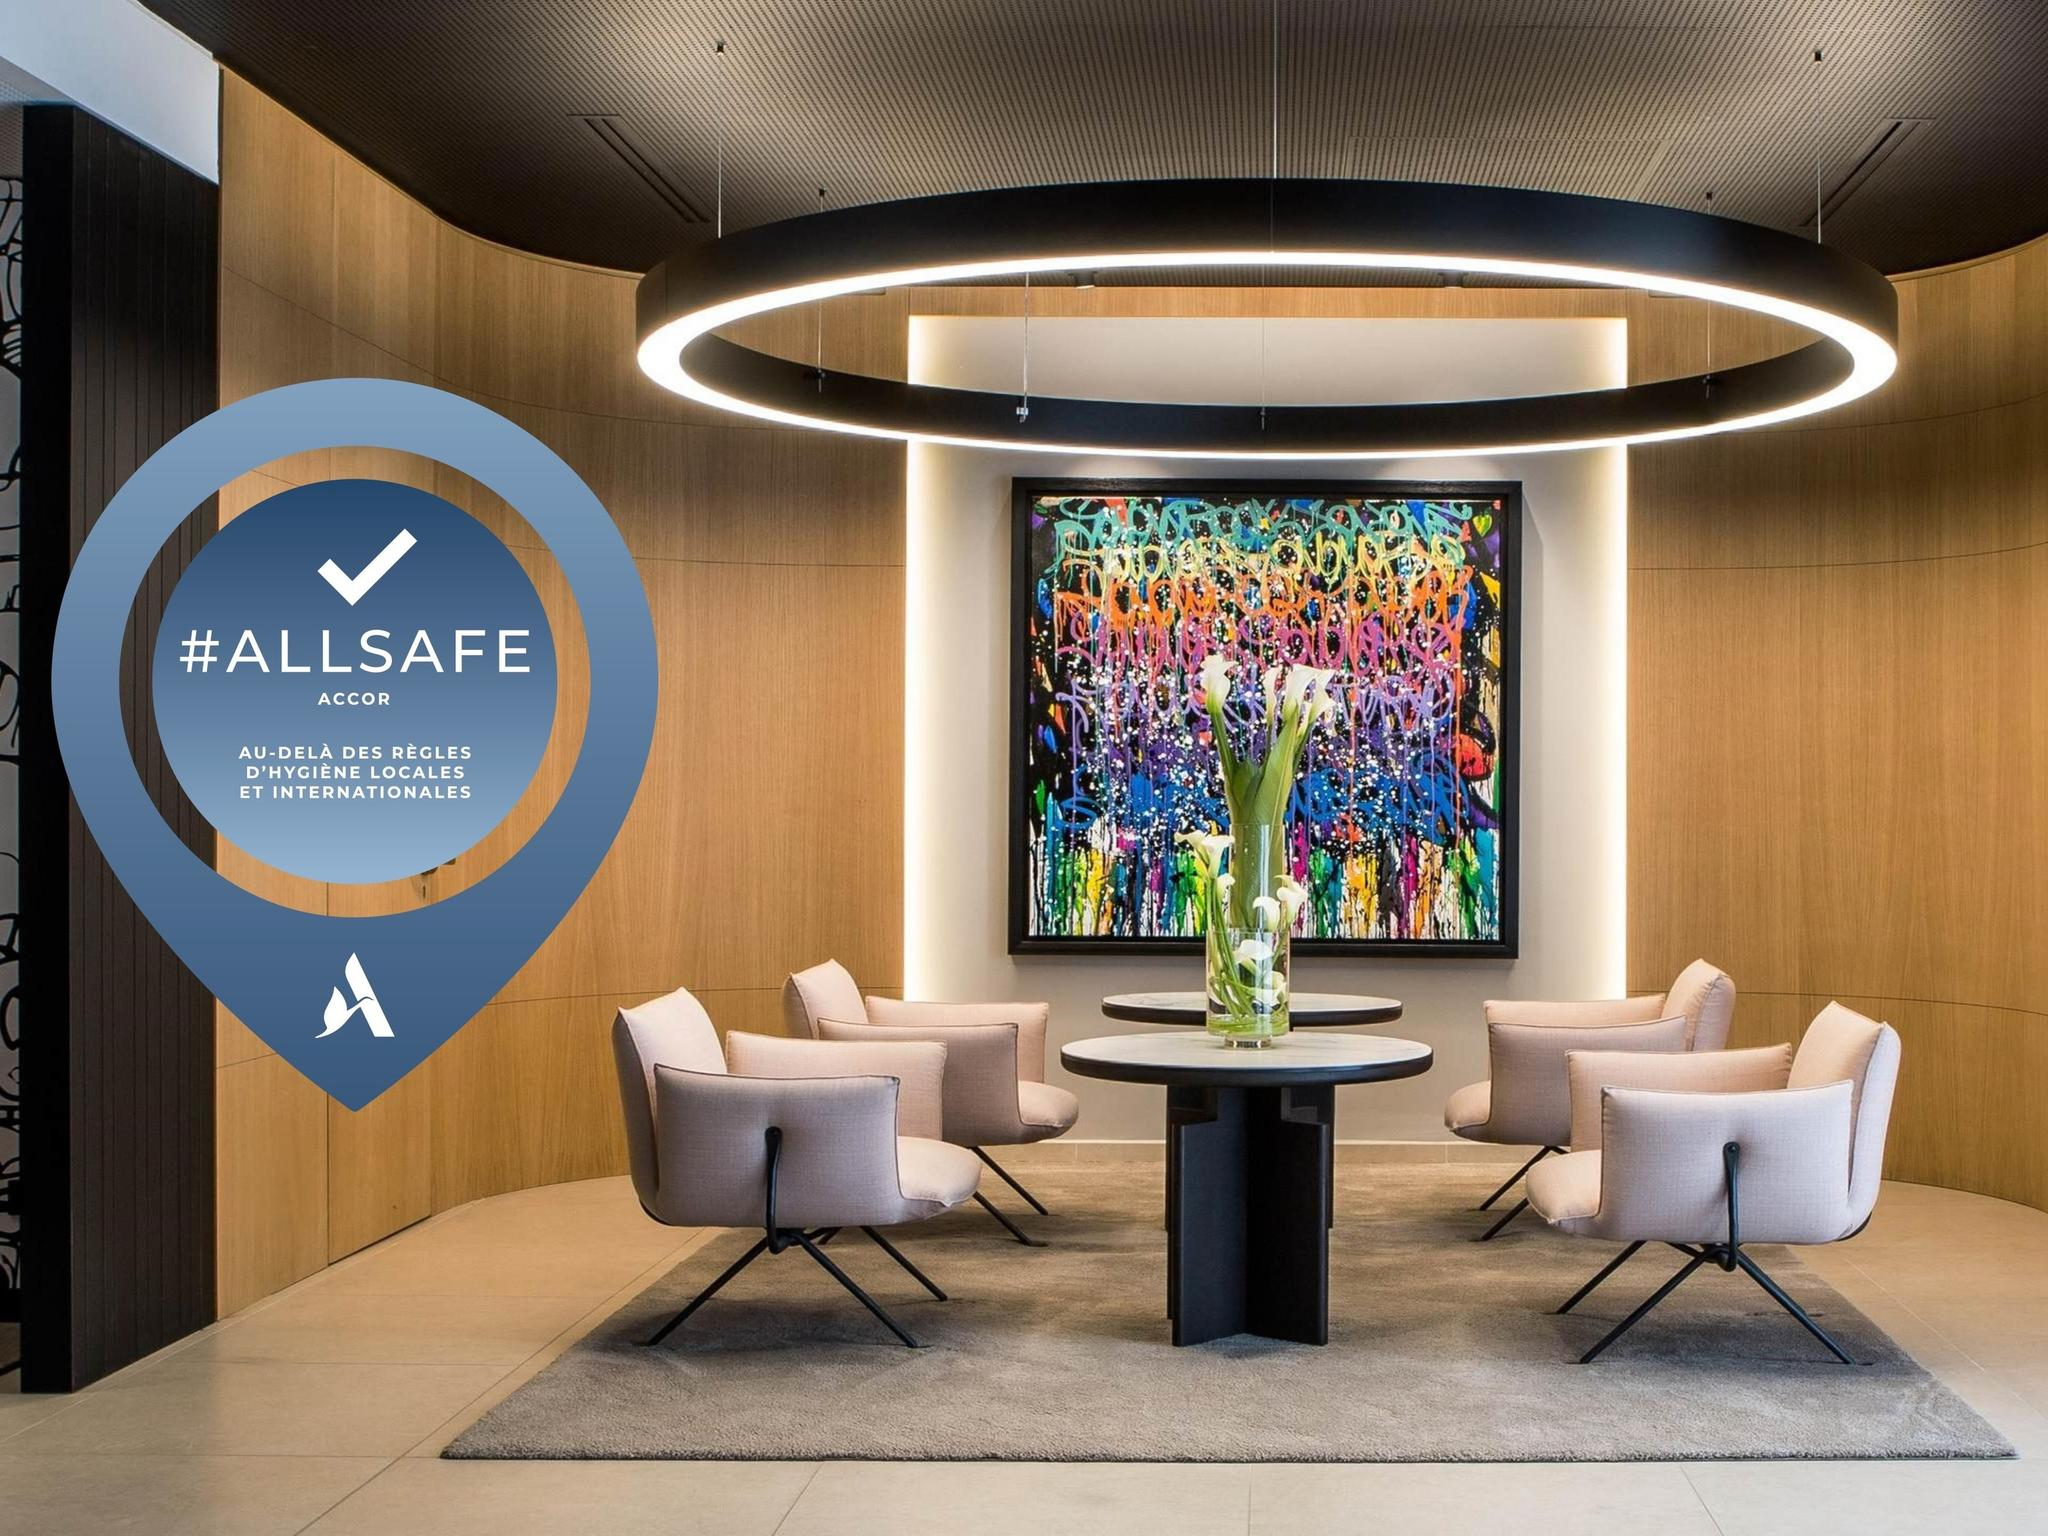 Hotel – Mercure Paris 17 Batignolles (opening: mei 2018)